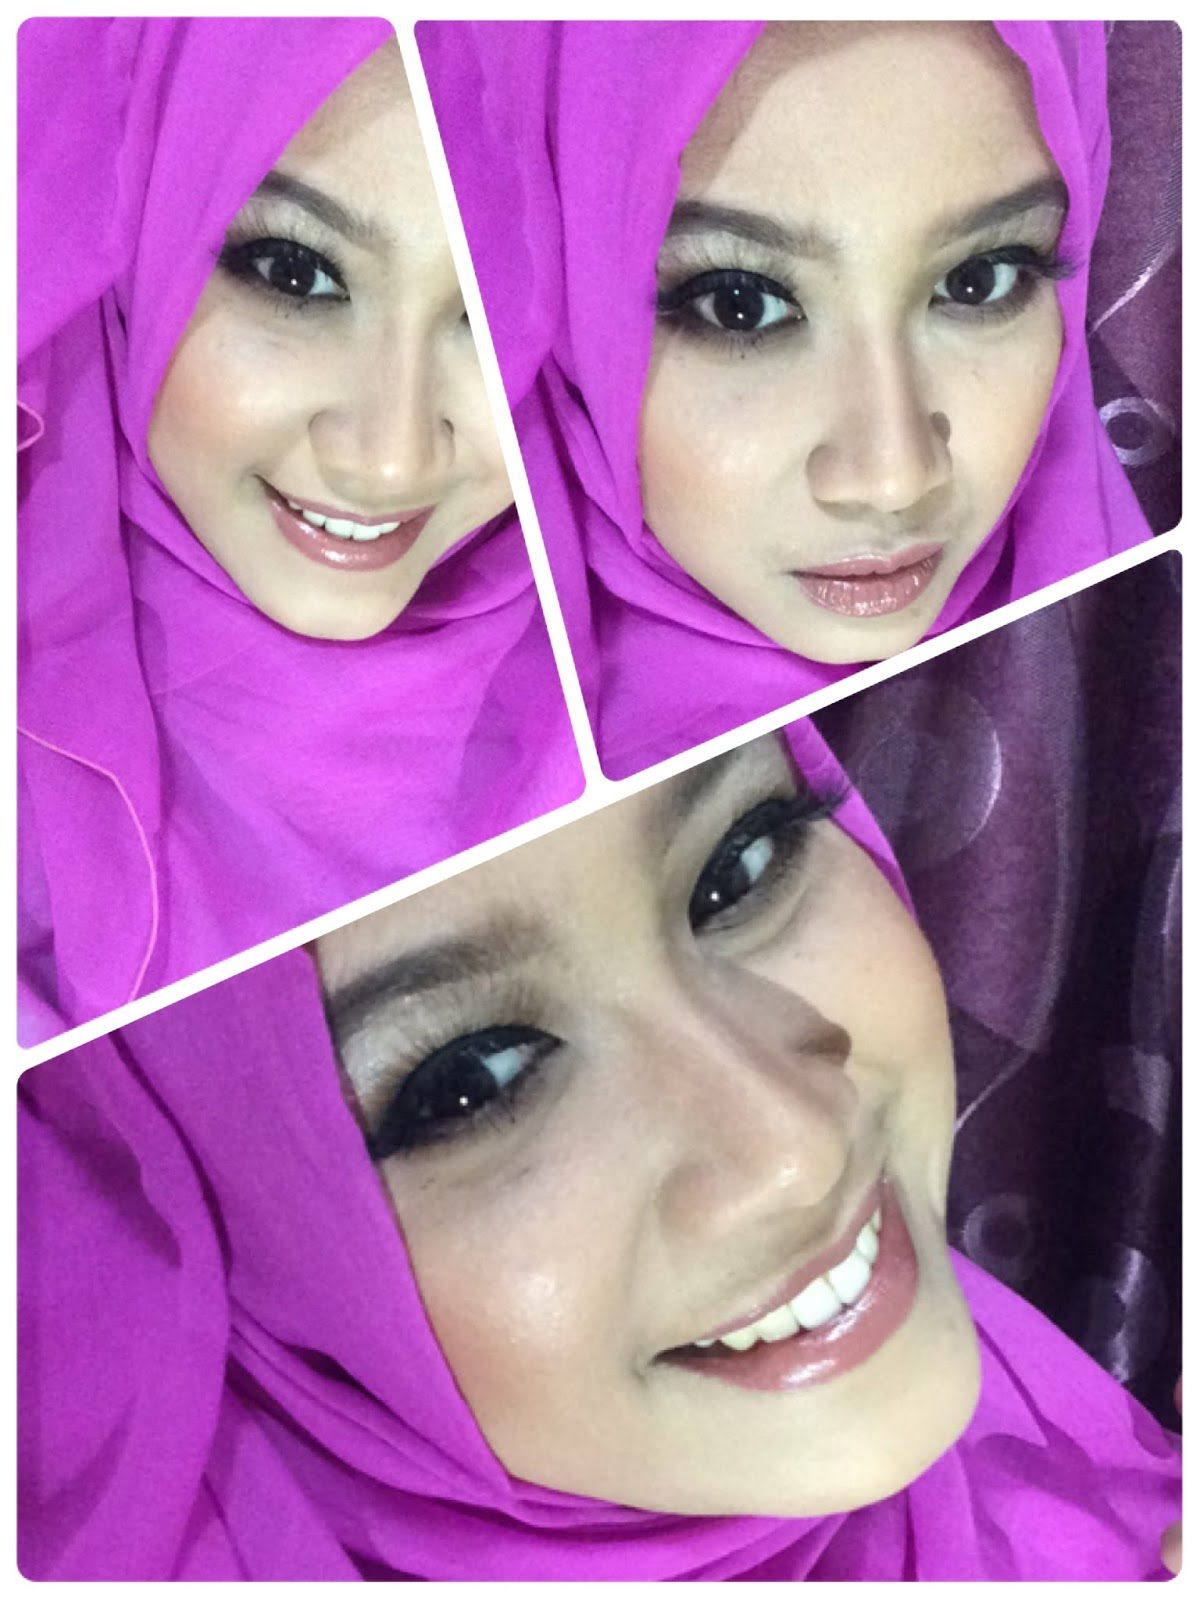 Hai Ariani Indonesian Beauty Blogger Inez Cosmetics Color Contour Plus Lipstick Riviera Blush Shade Desert Sand Review